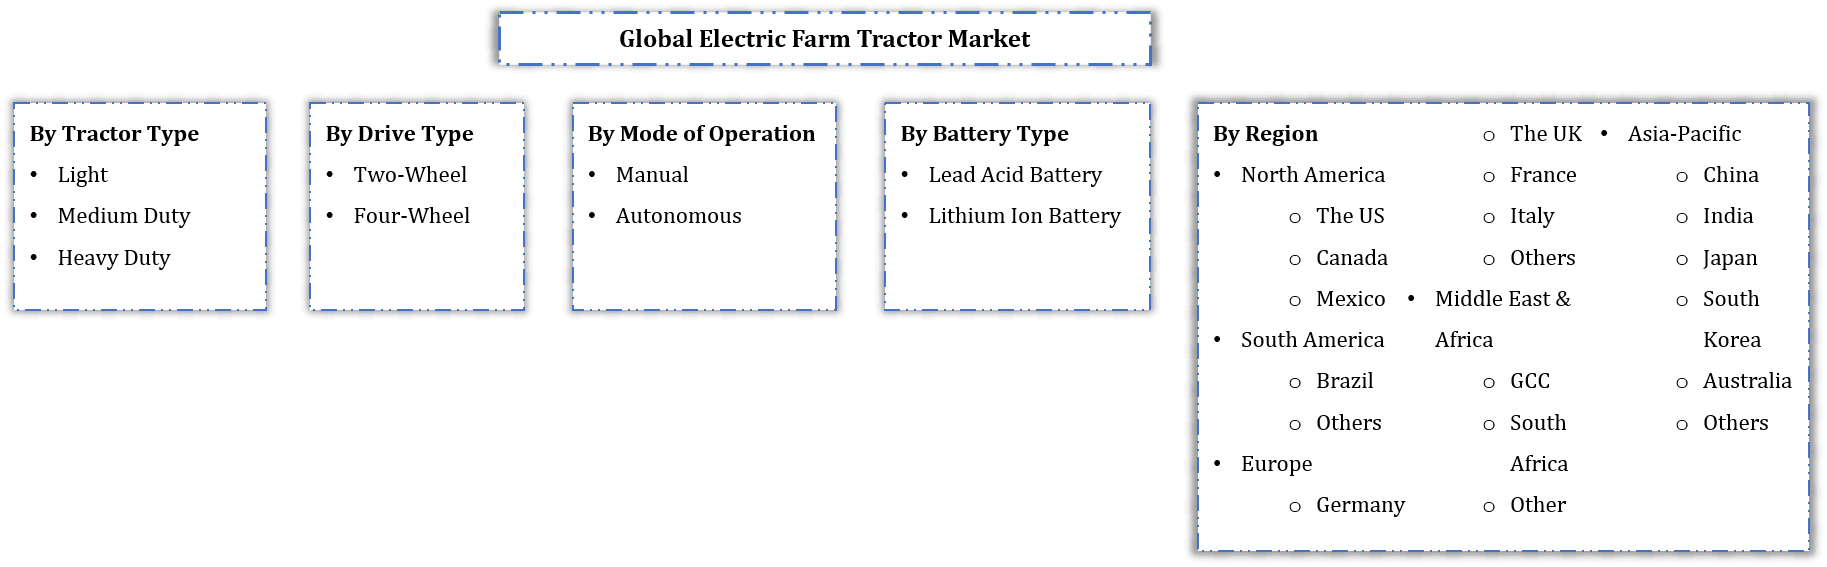 Global Electric Farm Tractor Market Segmentation